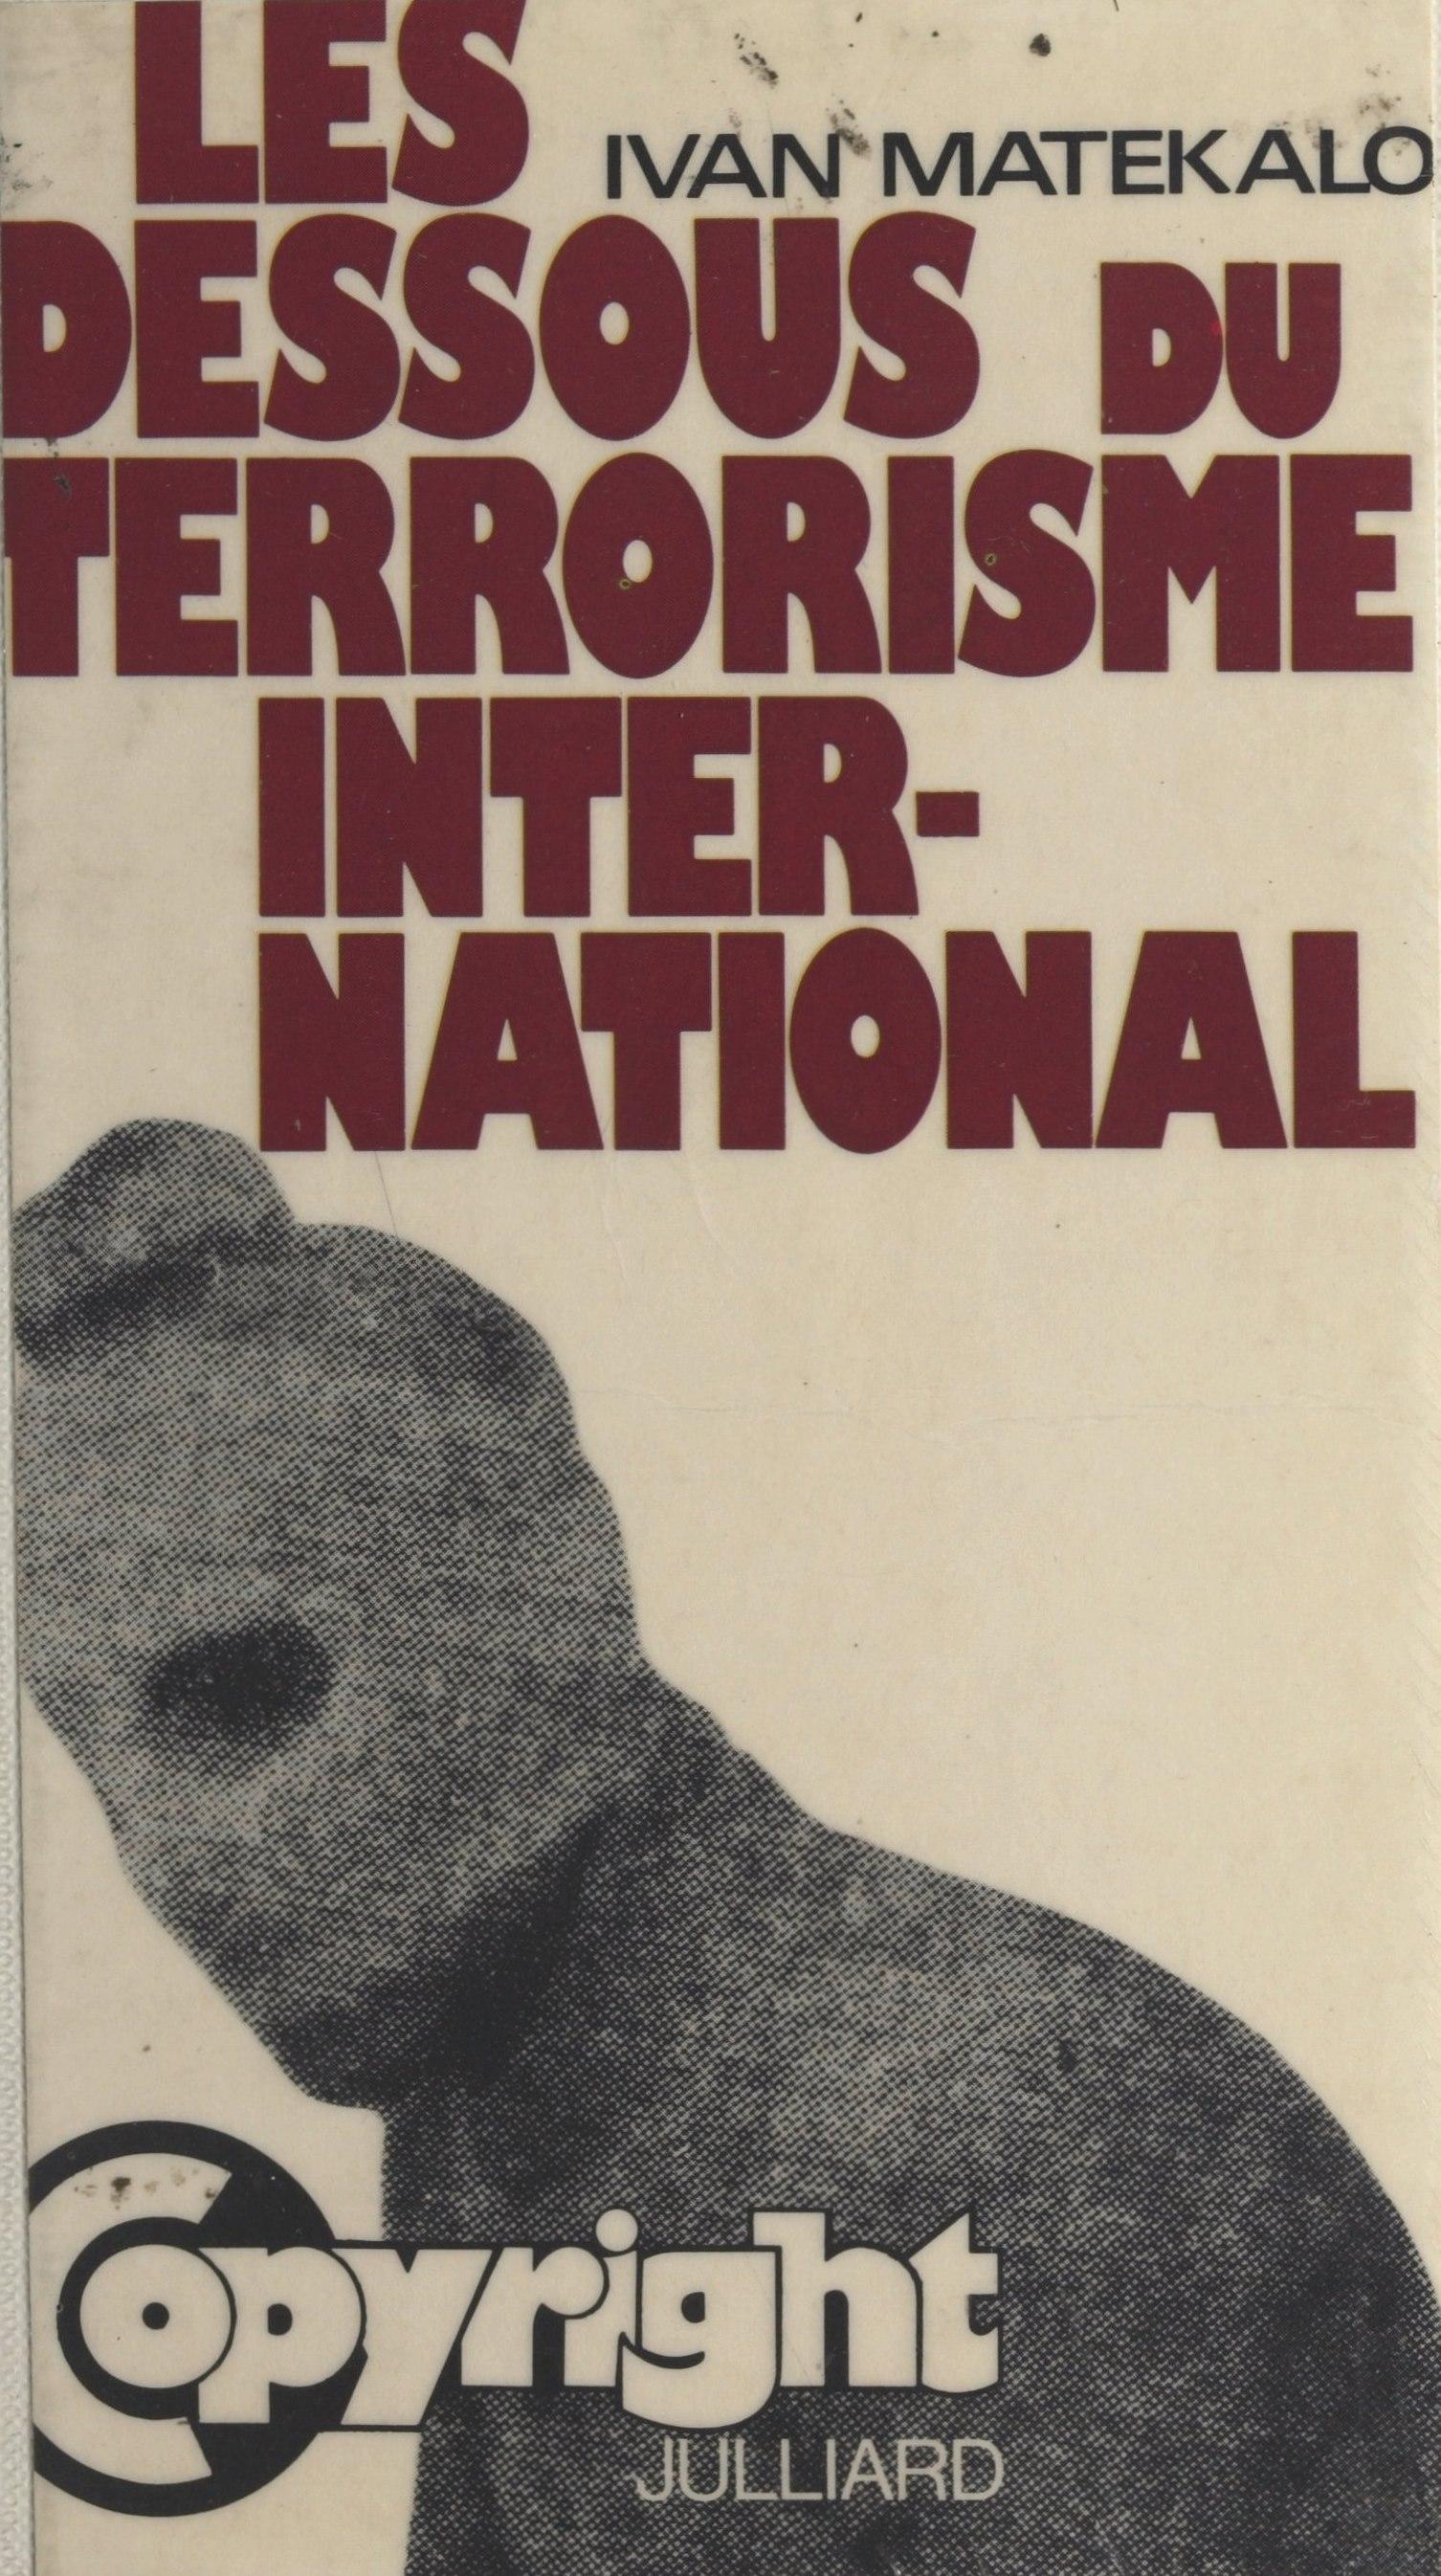 Les dessous du terrorisme i...